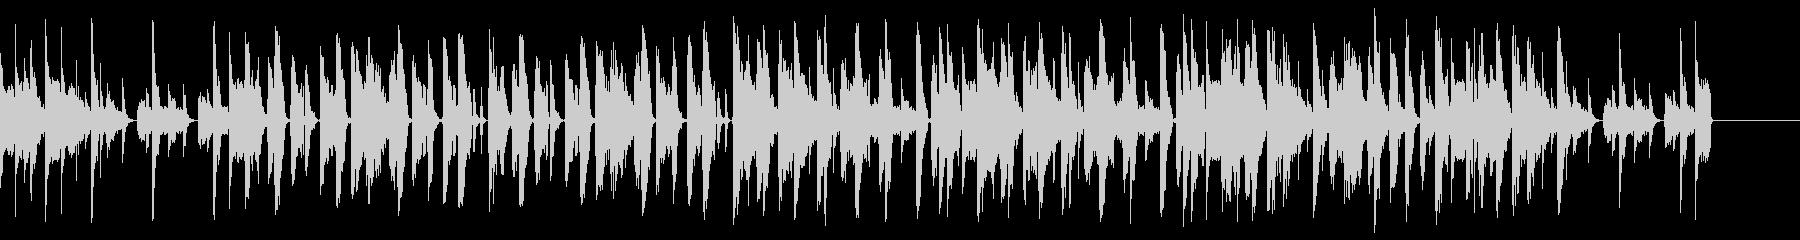 DJ エレクトロ ベース ジングルの未再生の波形